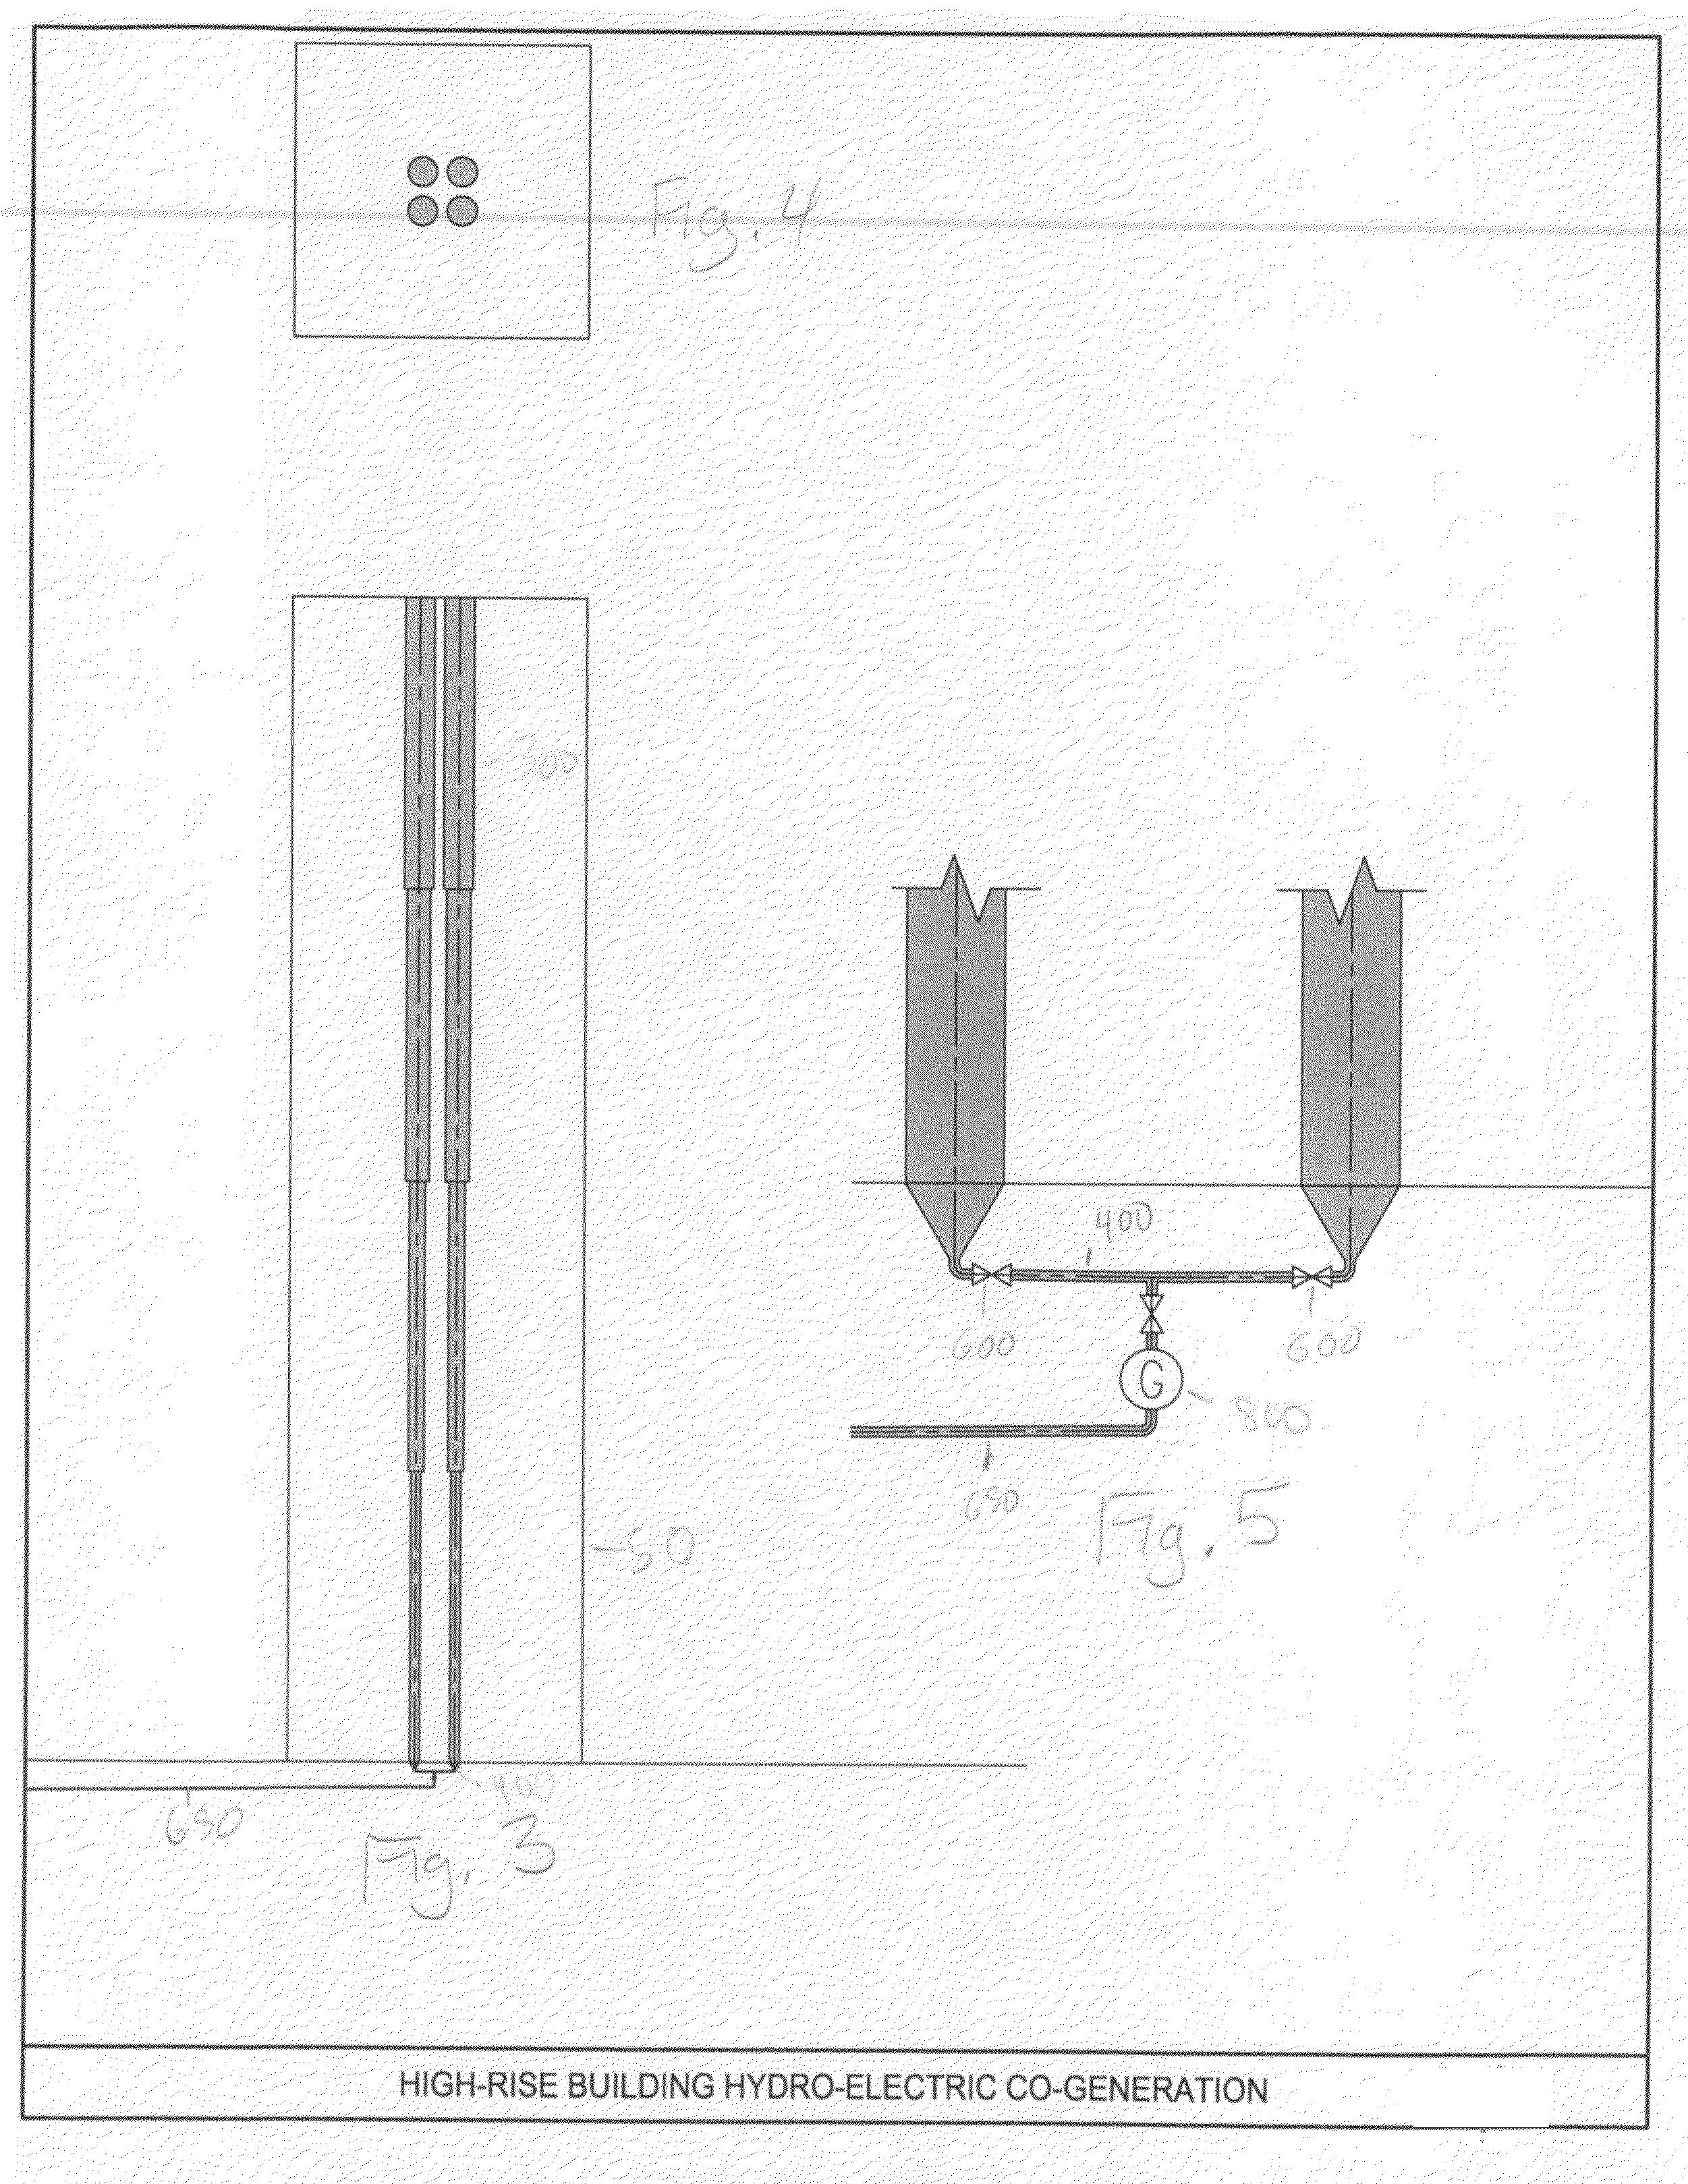 gm 7 way rv plug wiring diagram electrical drawing of high rise building ndash the wiring 7 way boat trailer wiring diagram